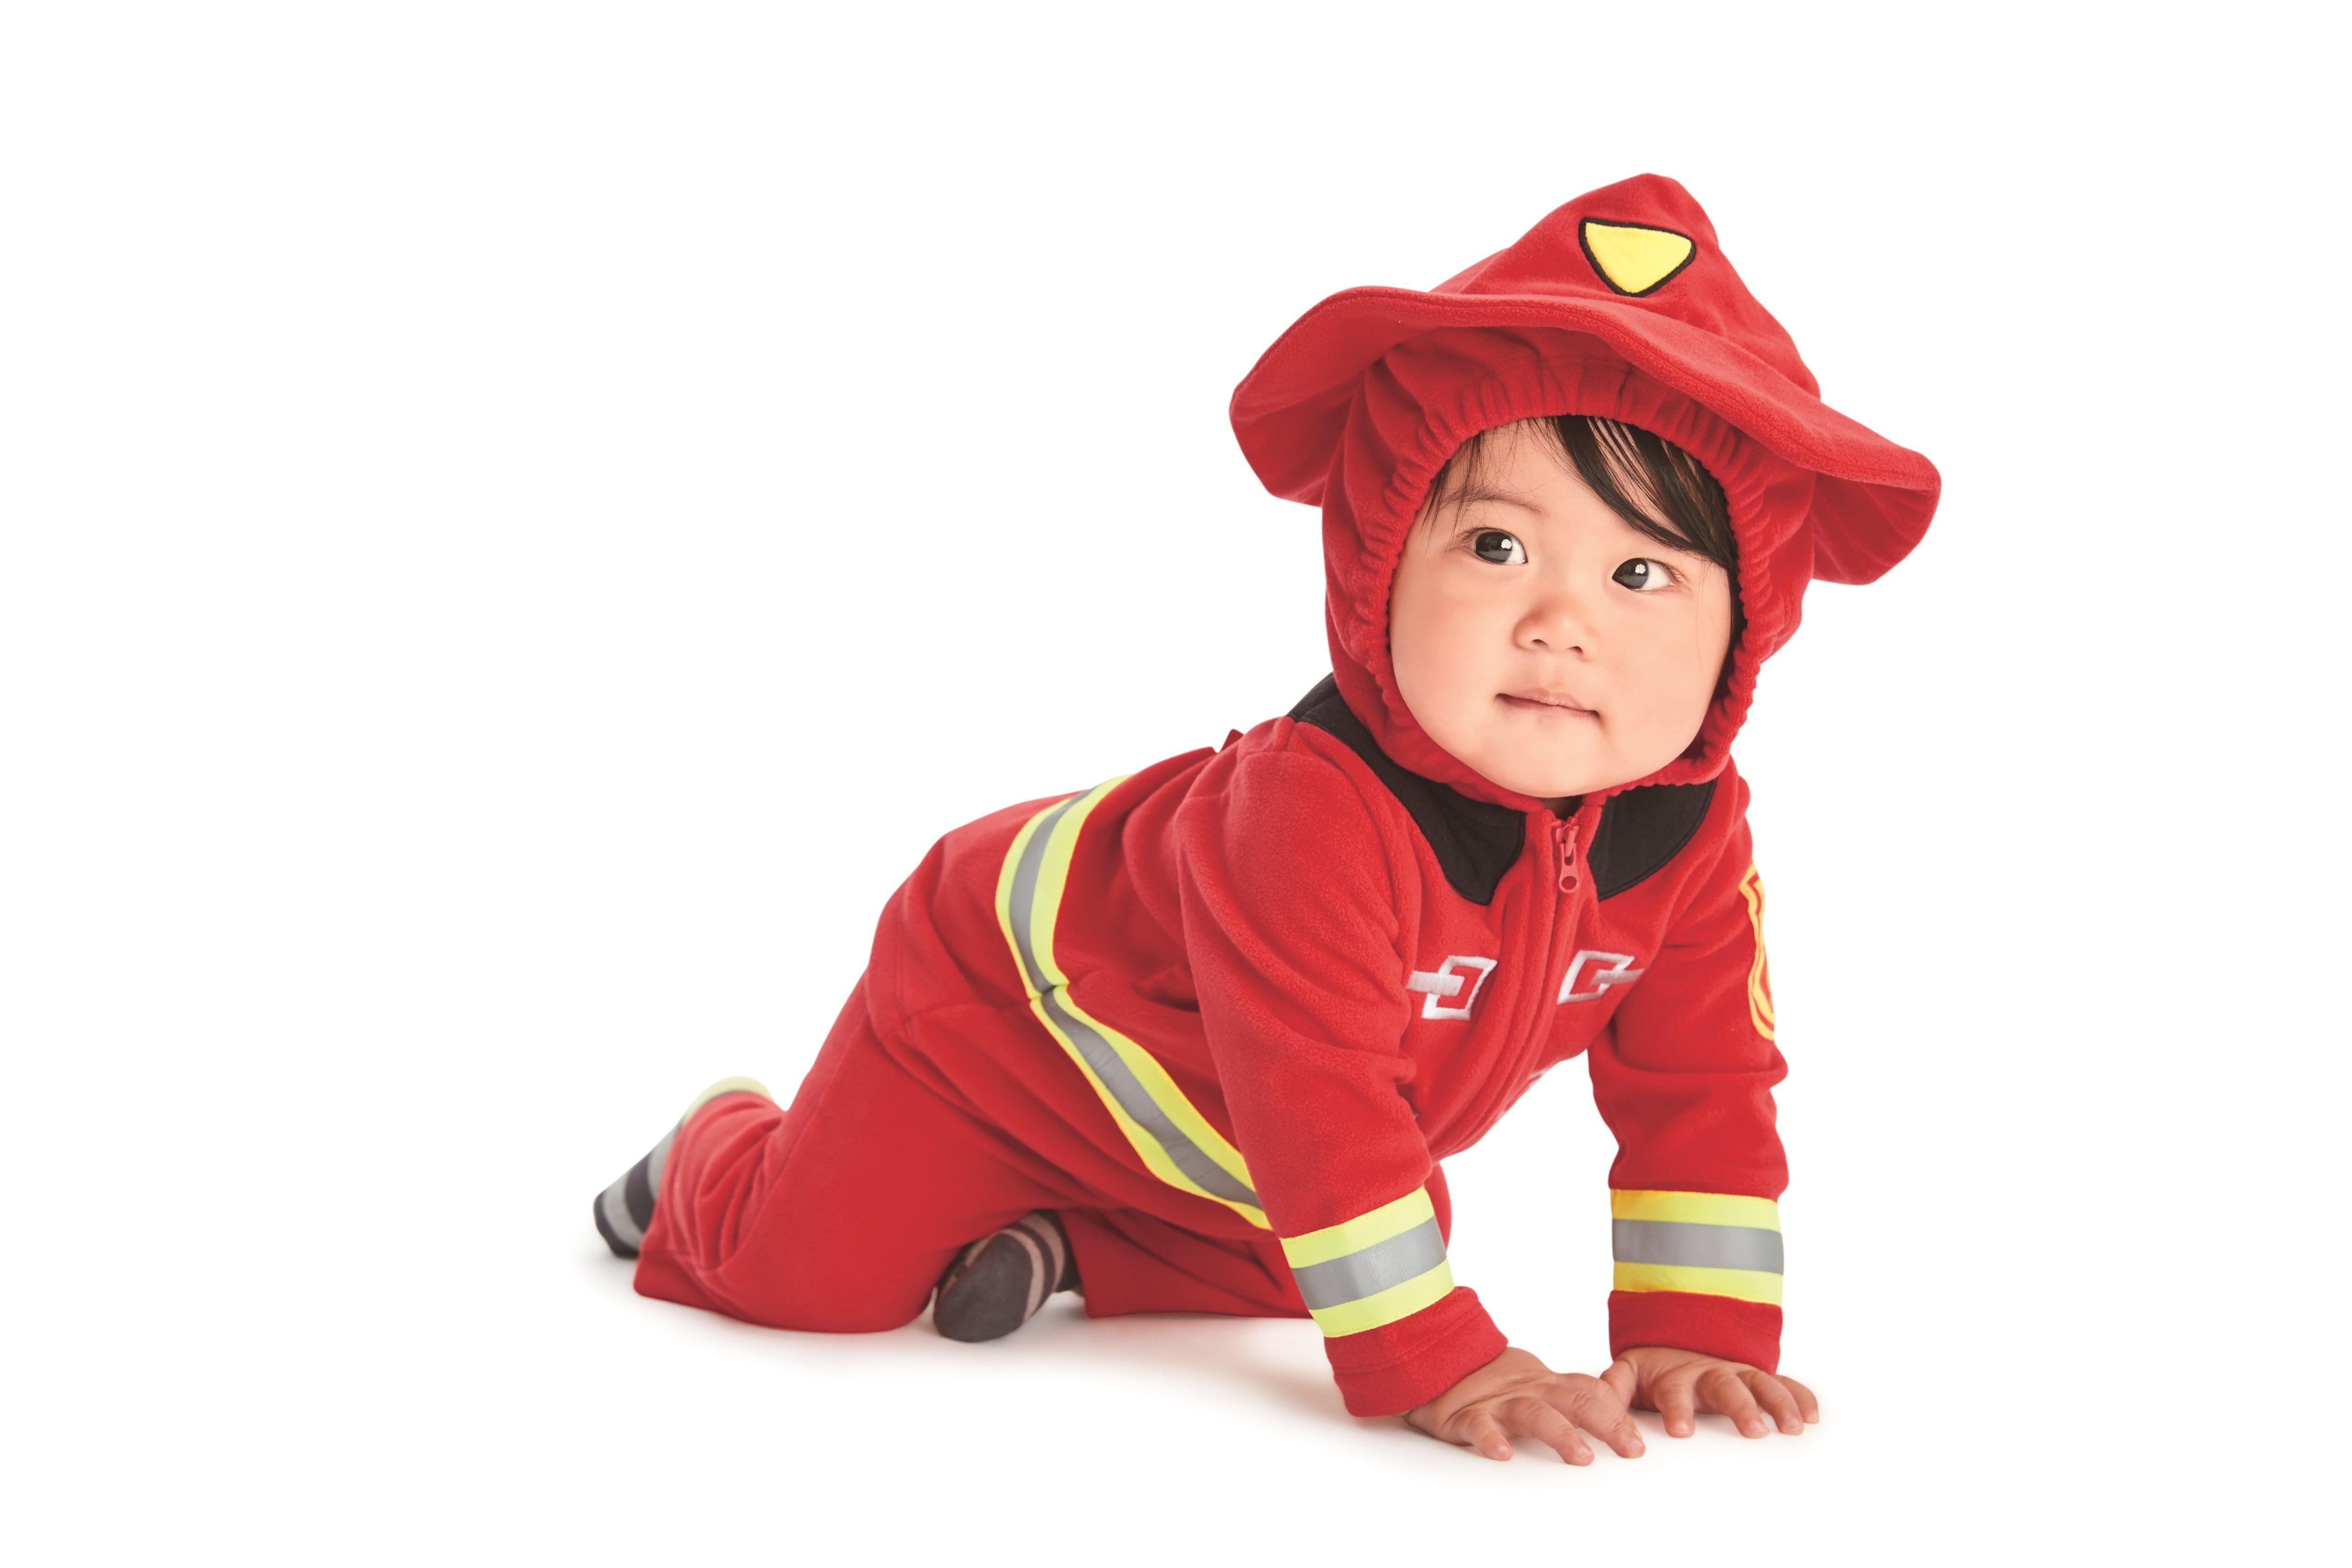 ... Little Firefighter Halloween Costume  sc 1 st  Carteru0027s & Little Firefighter Halloween Costume | Carters.com